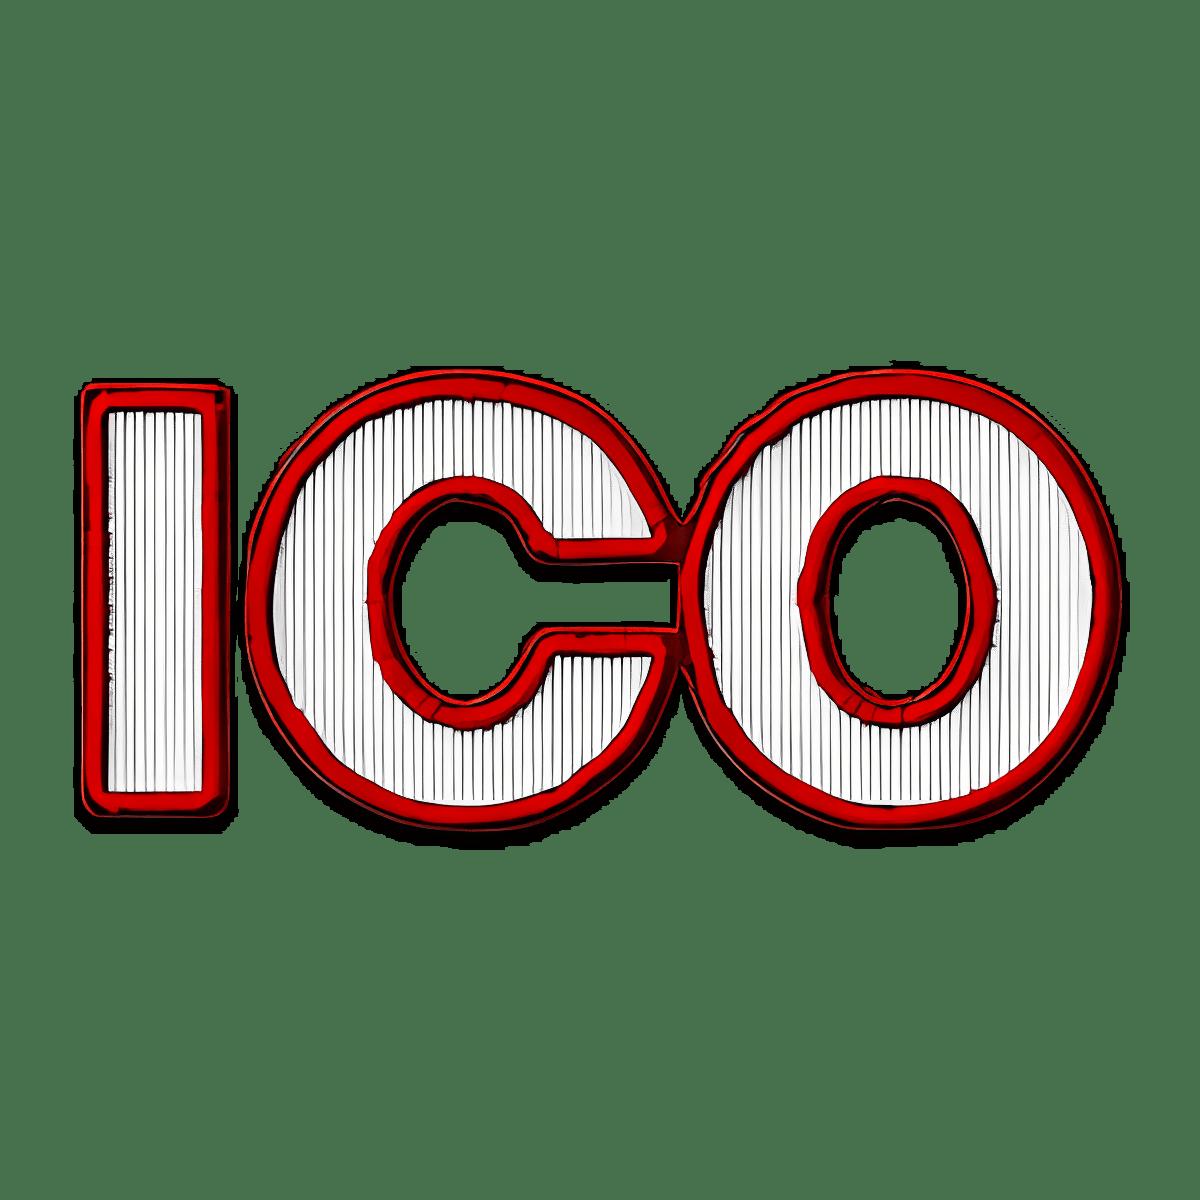 STITCH - Icon Pack